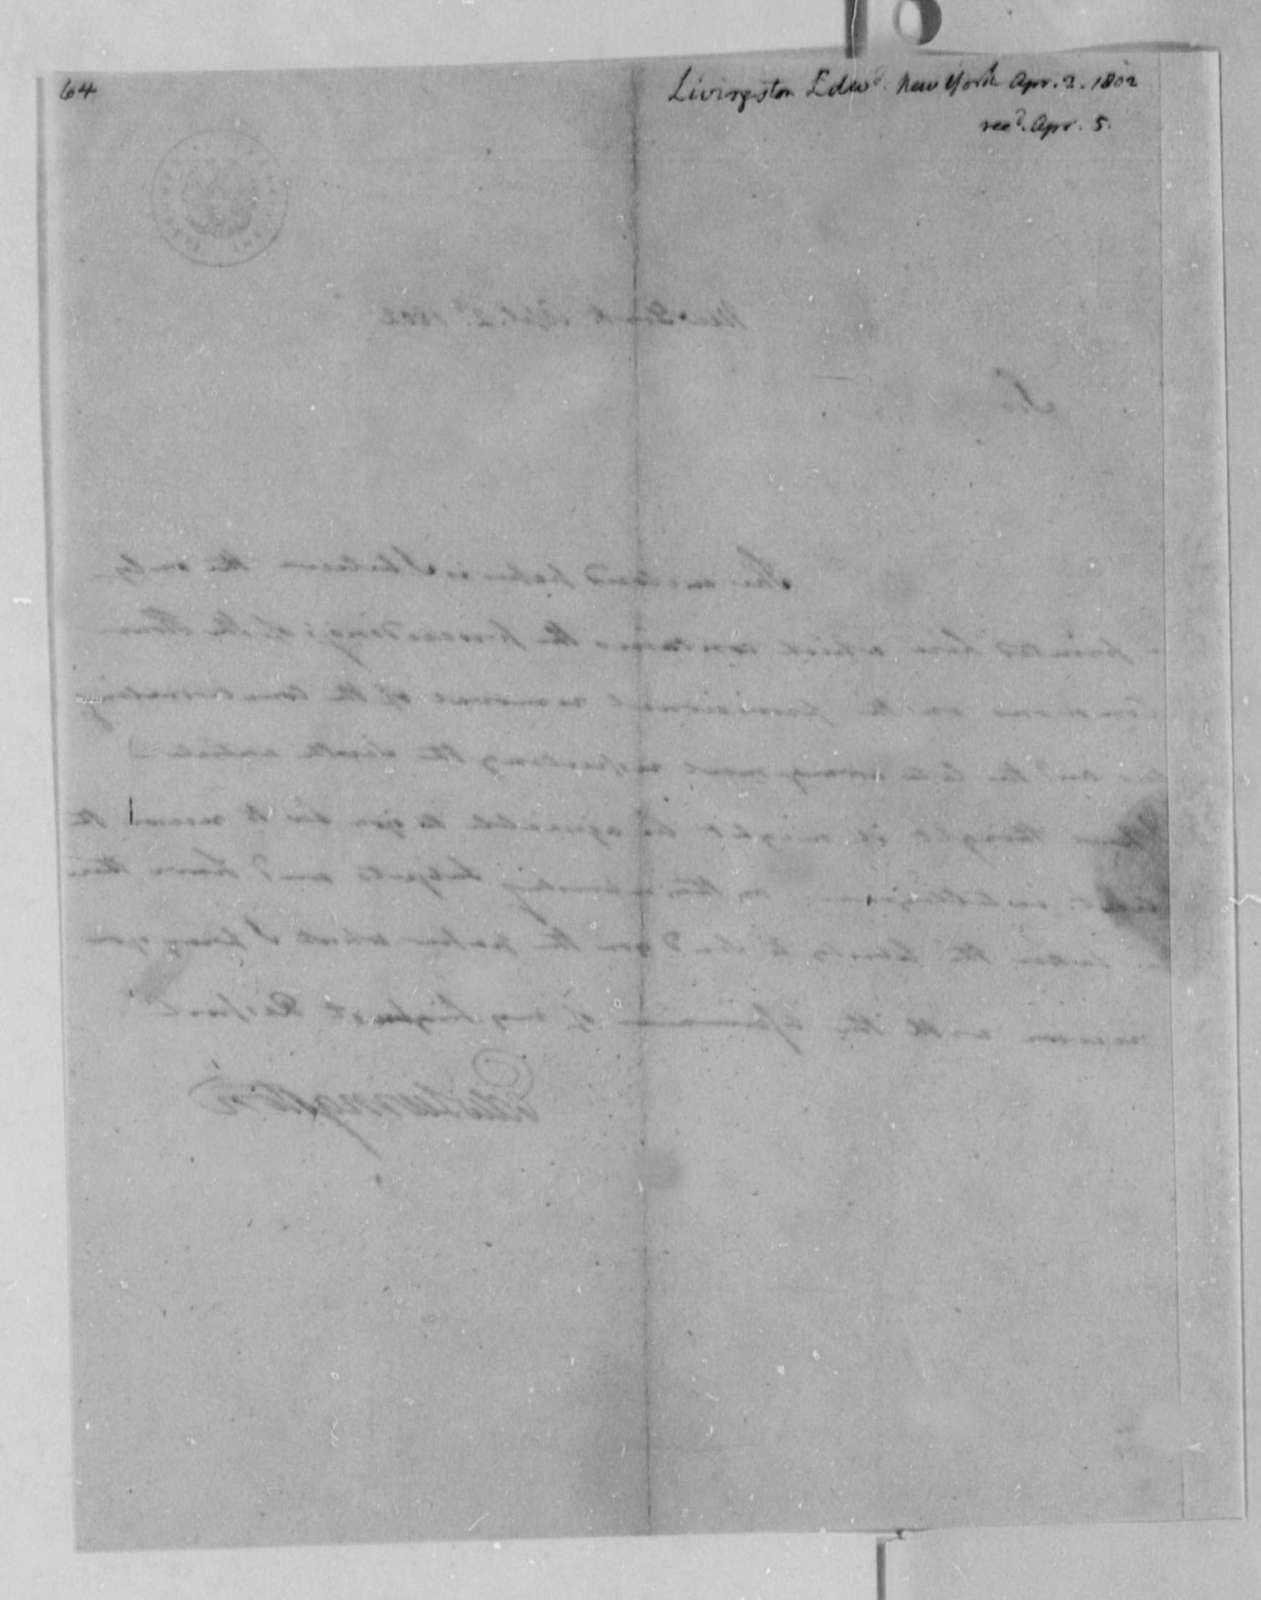 Edward Livingston to Thomas Jefferson, April 2, 1802